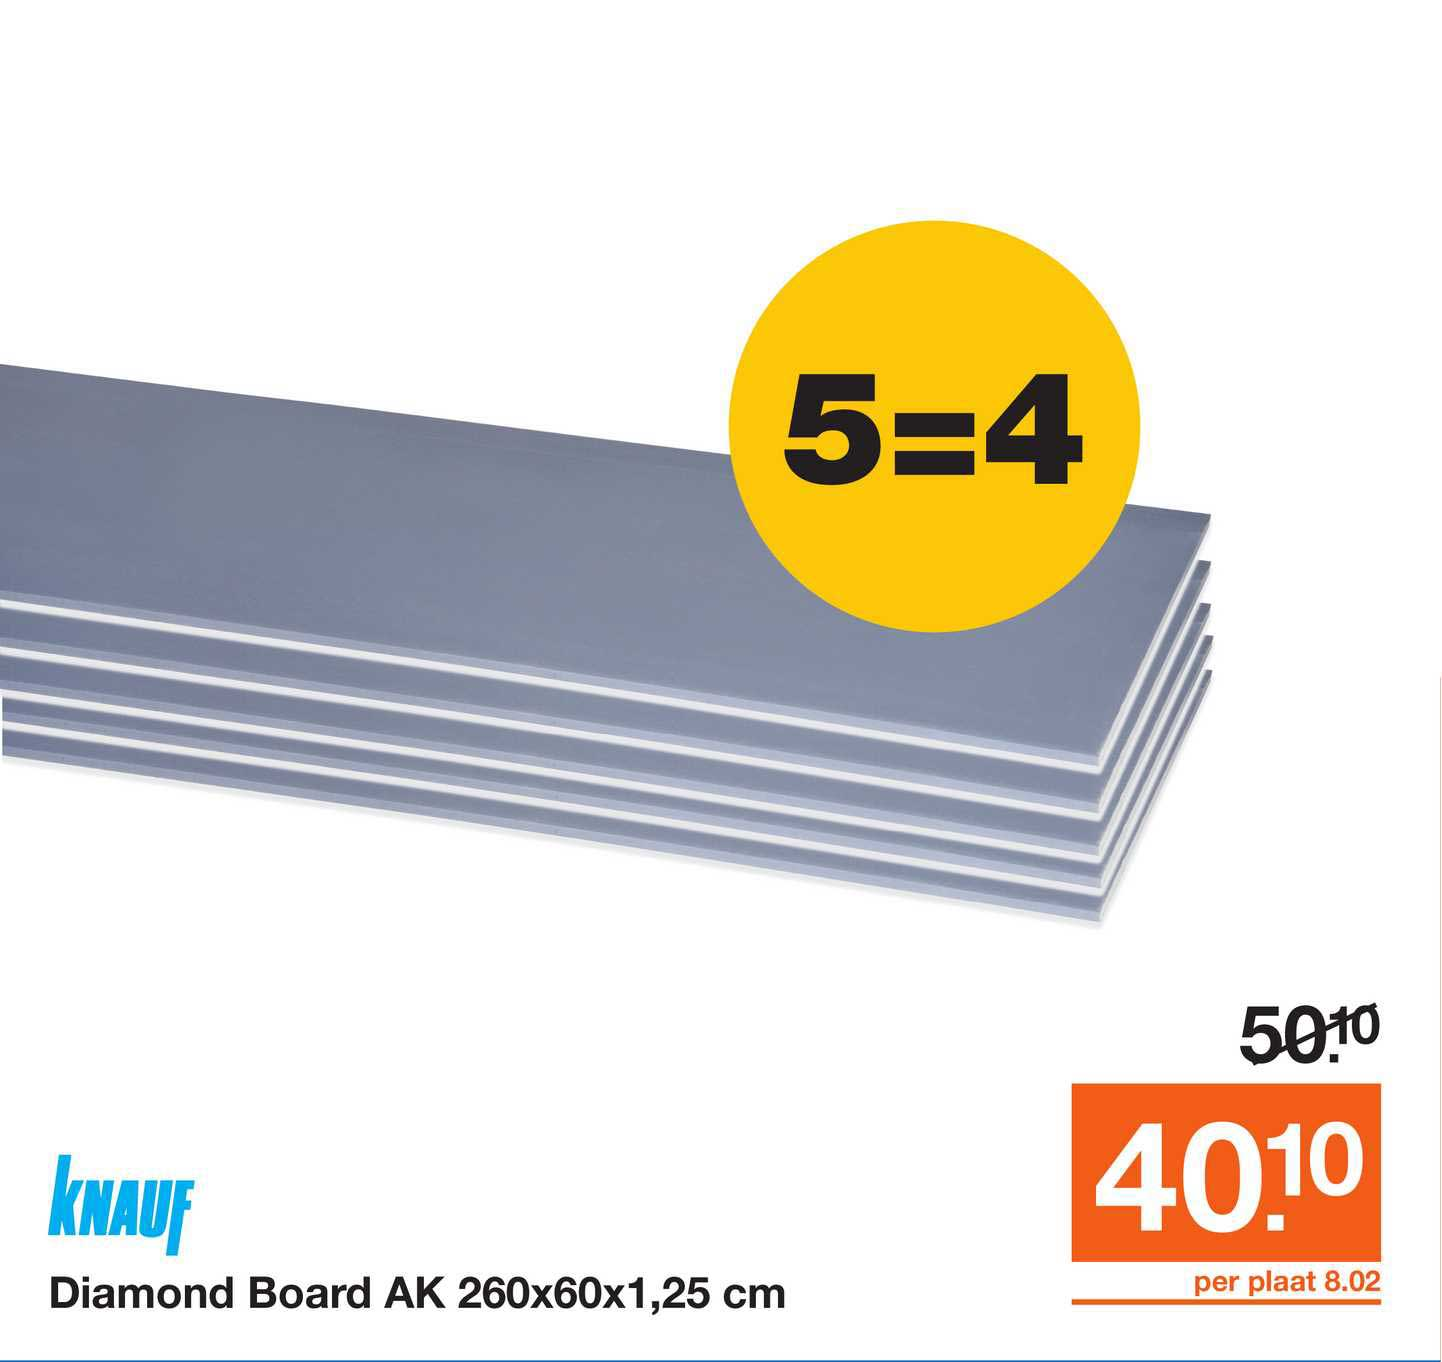 Bouwmaat Knauf Diamond Board AK 260x60x1,25 Cm